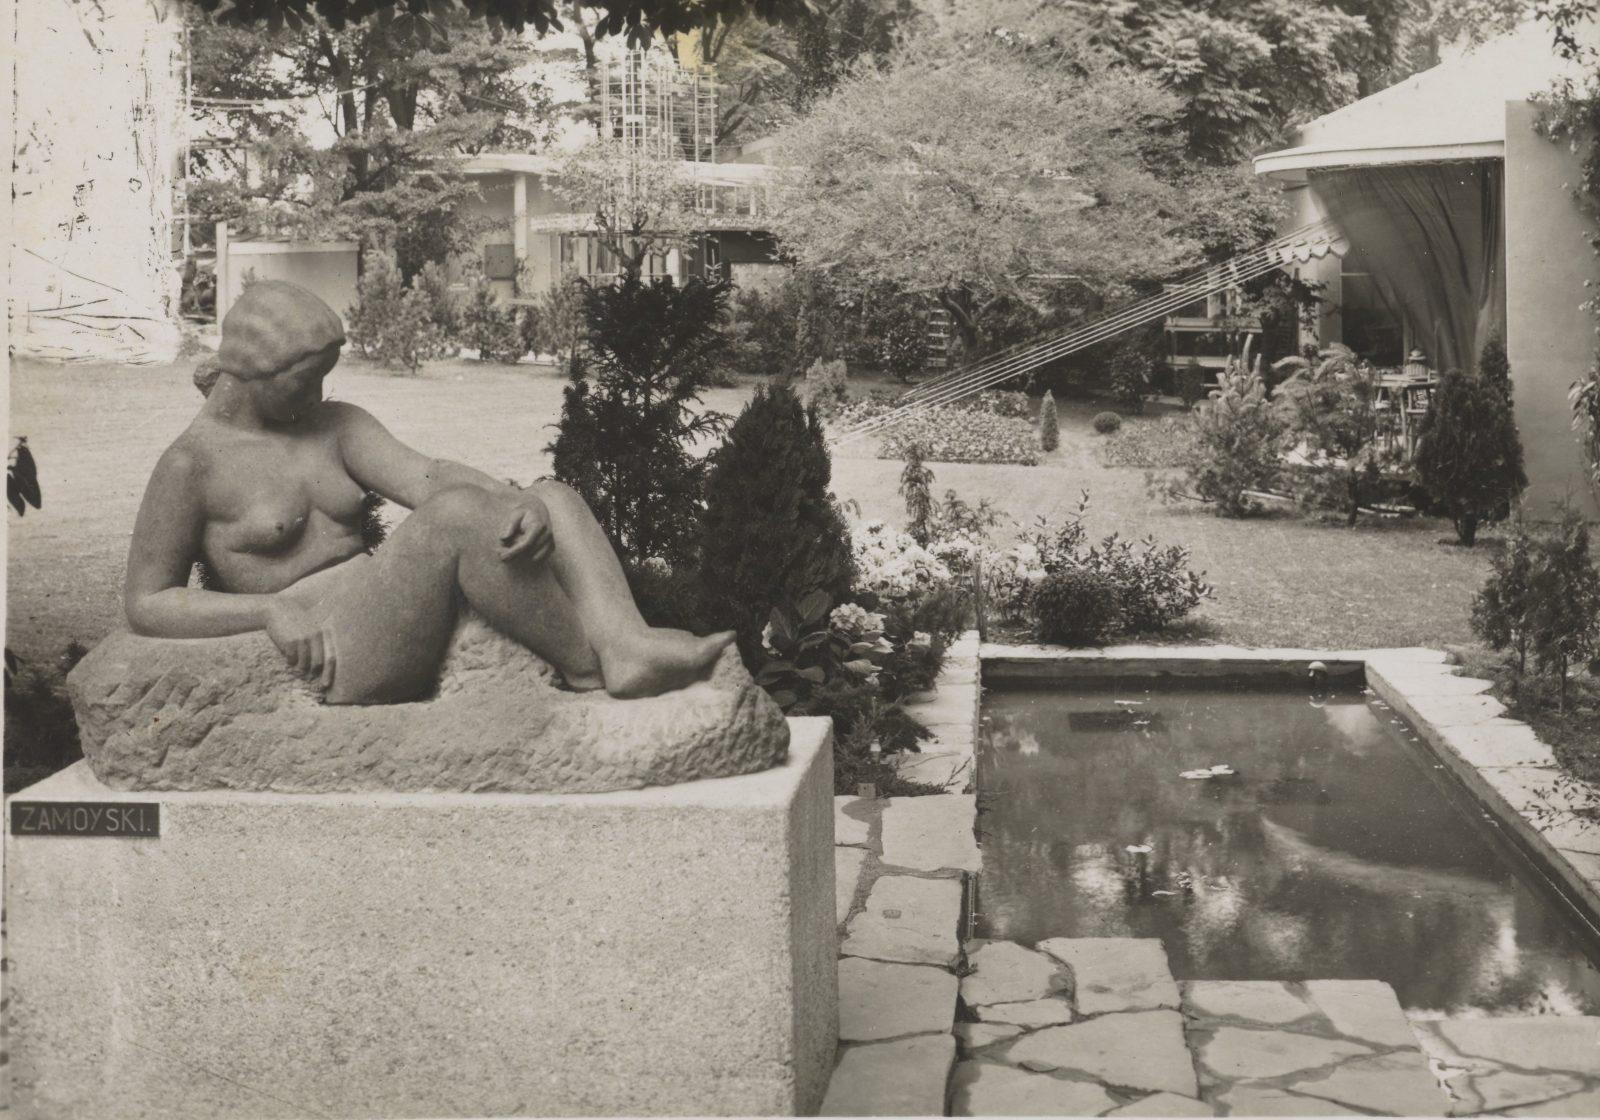 Garden view design by Alina Scholtz, sculpture by August Zamoyski, photo F. Witczak, Paris, 1937, file no. DŻS XII 8b/p.49/1, Polona – public domain